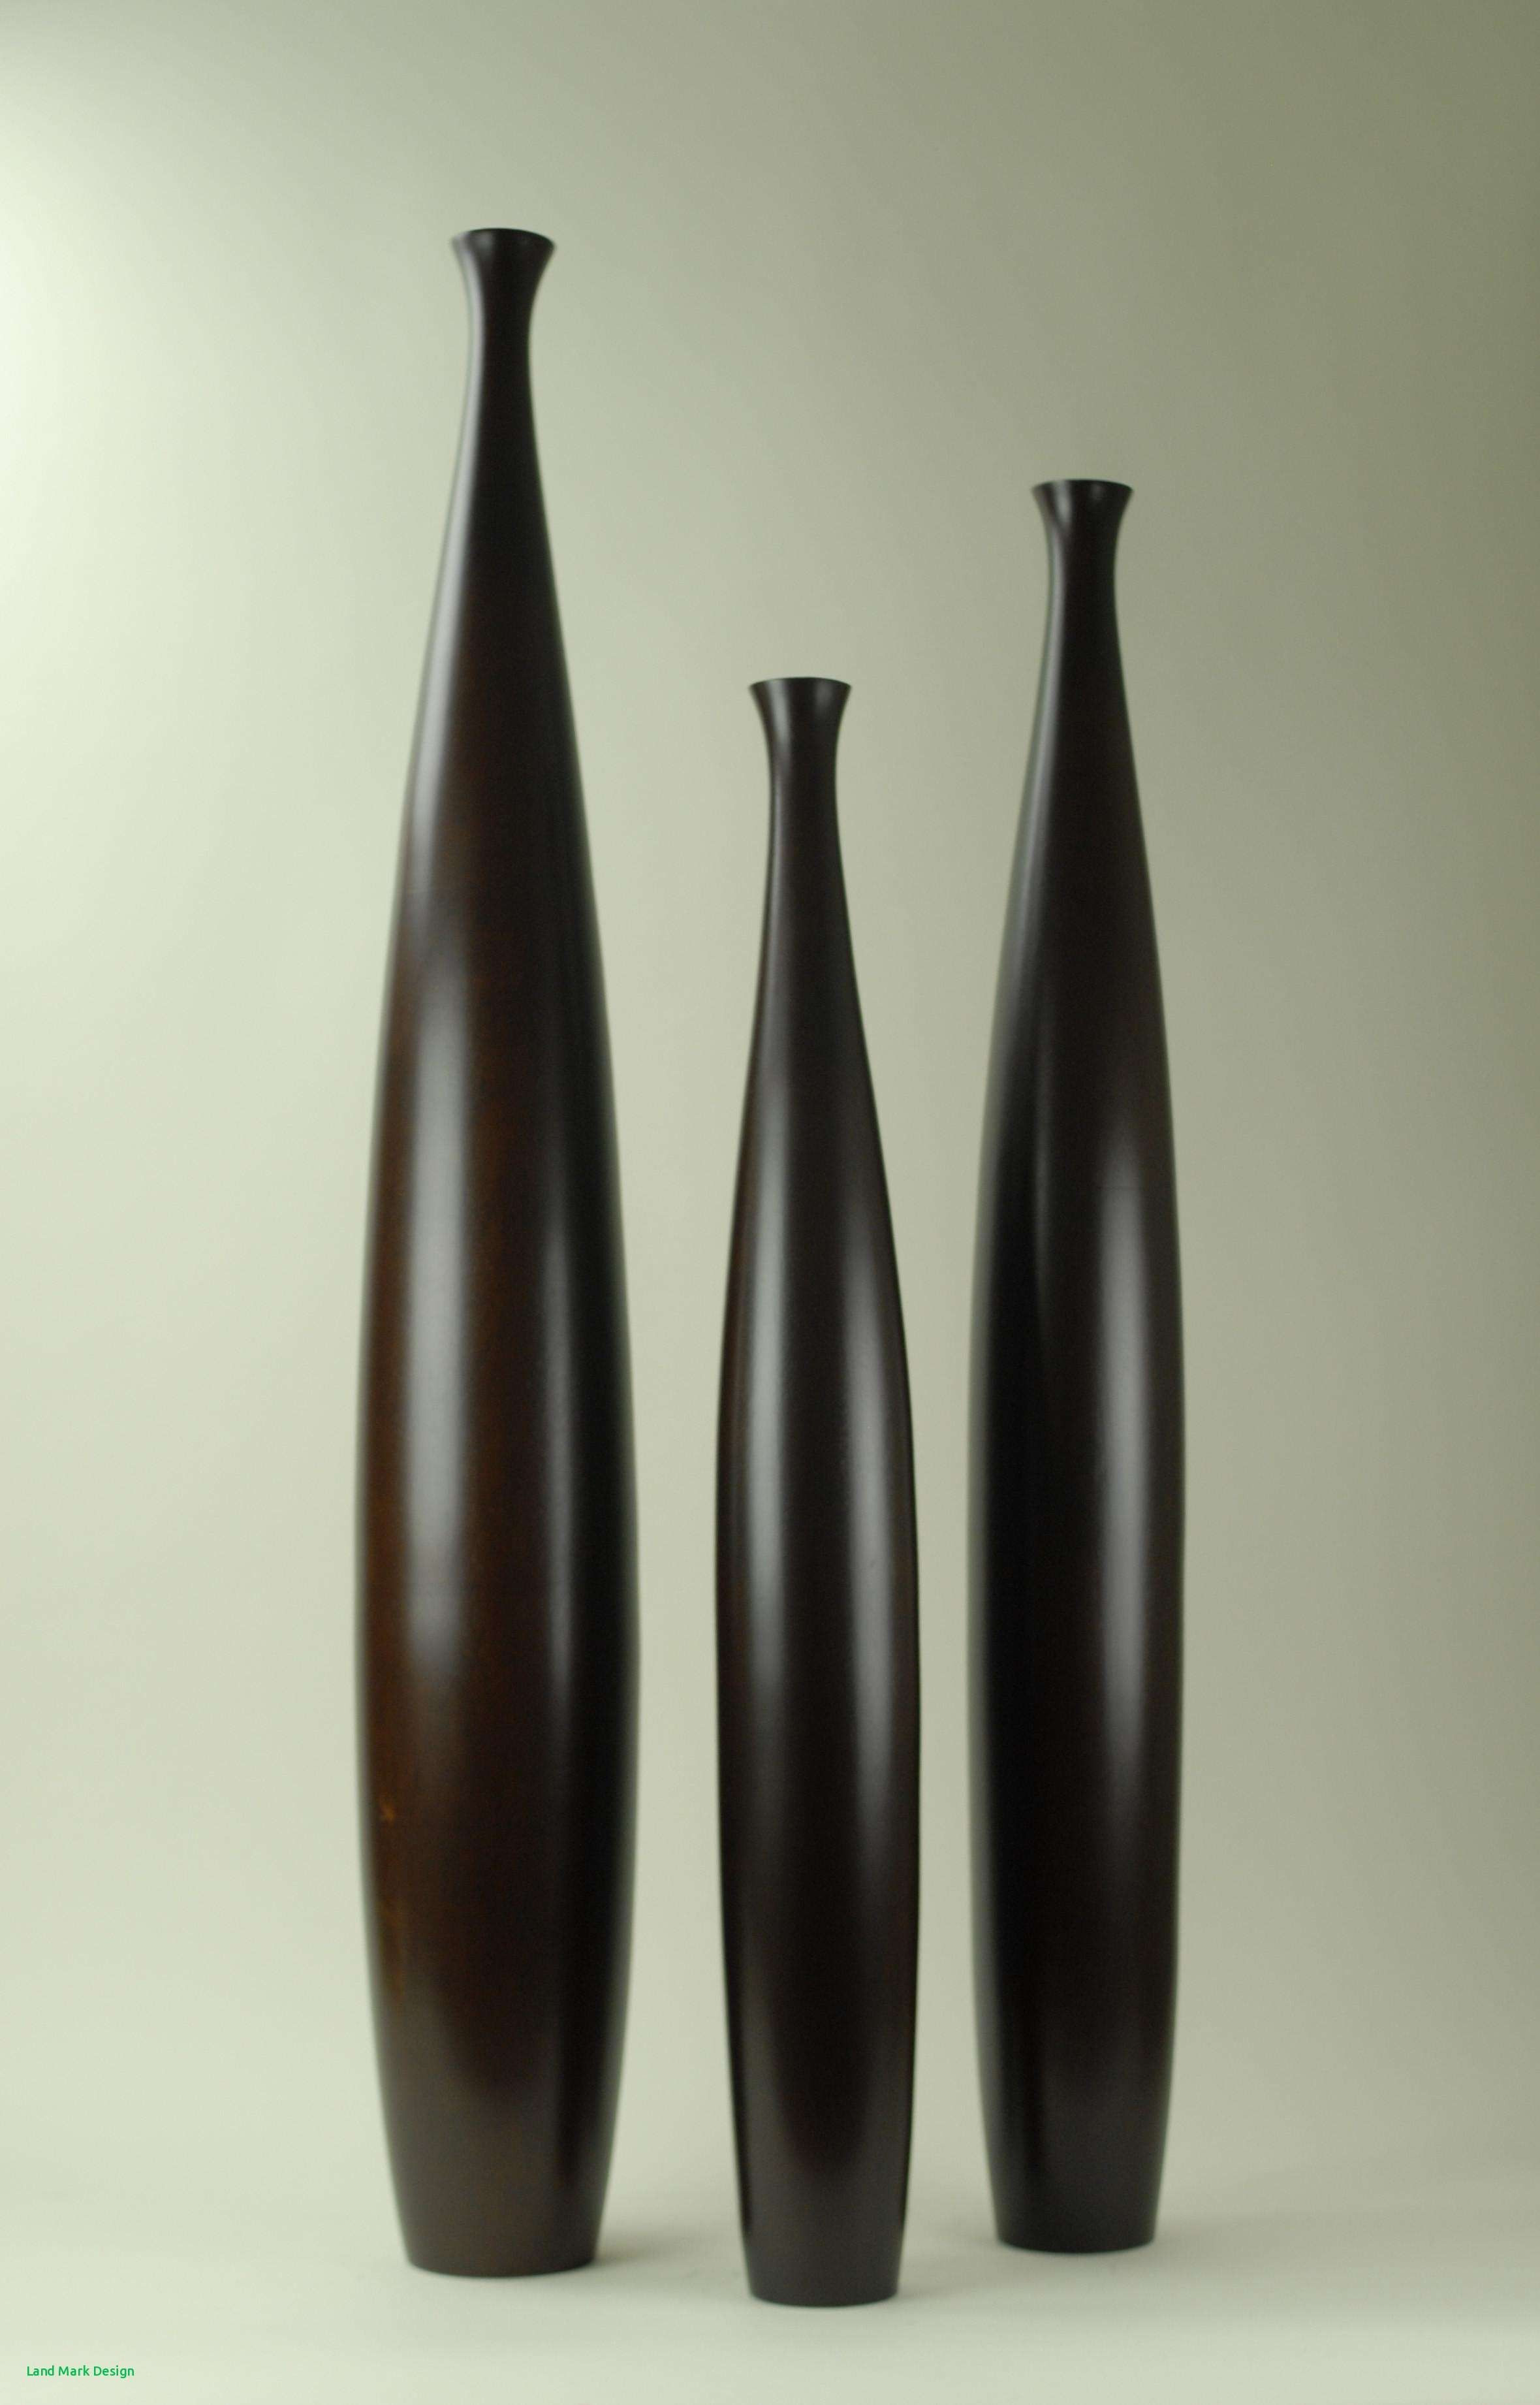 26 Wonderful Large Vase Stand 2021 free download large vase stand of 30 large floor vase the weekly world inside white floor vase ceramic modern 40 inchl home design ikea inch